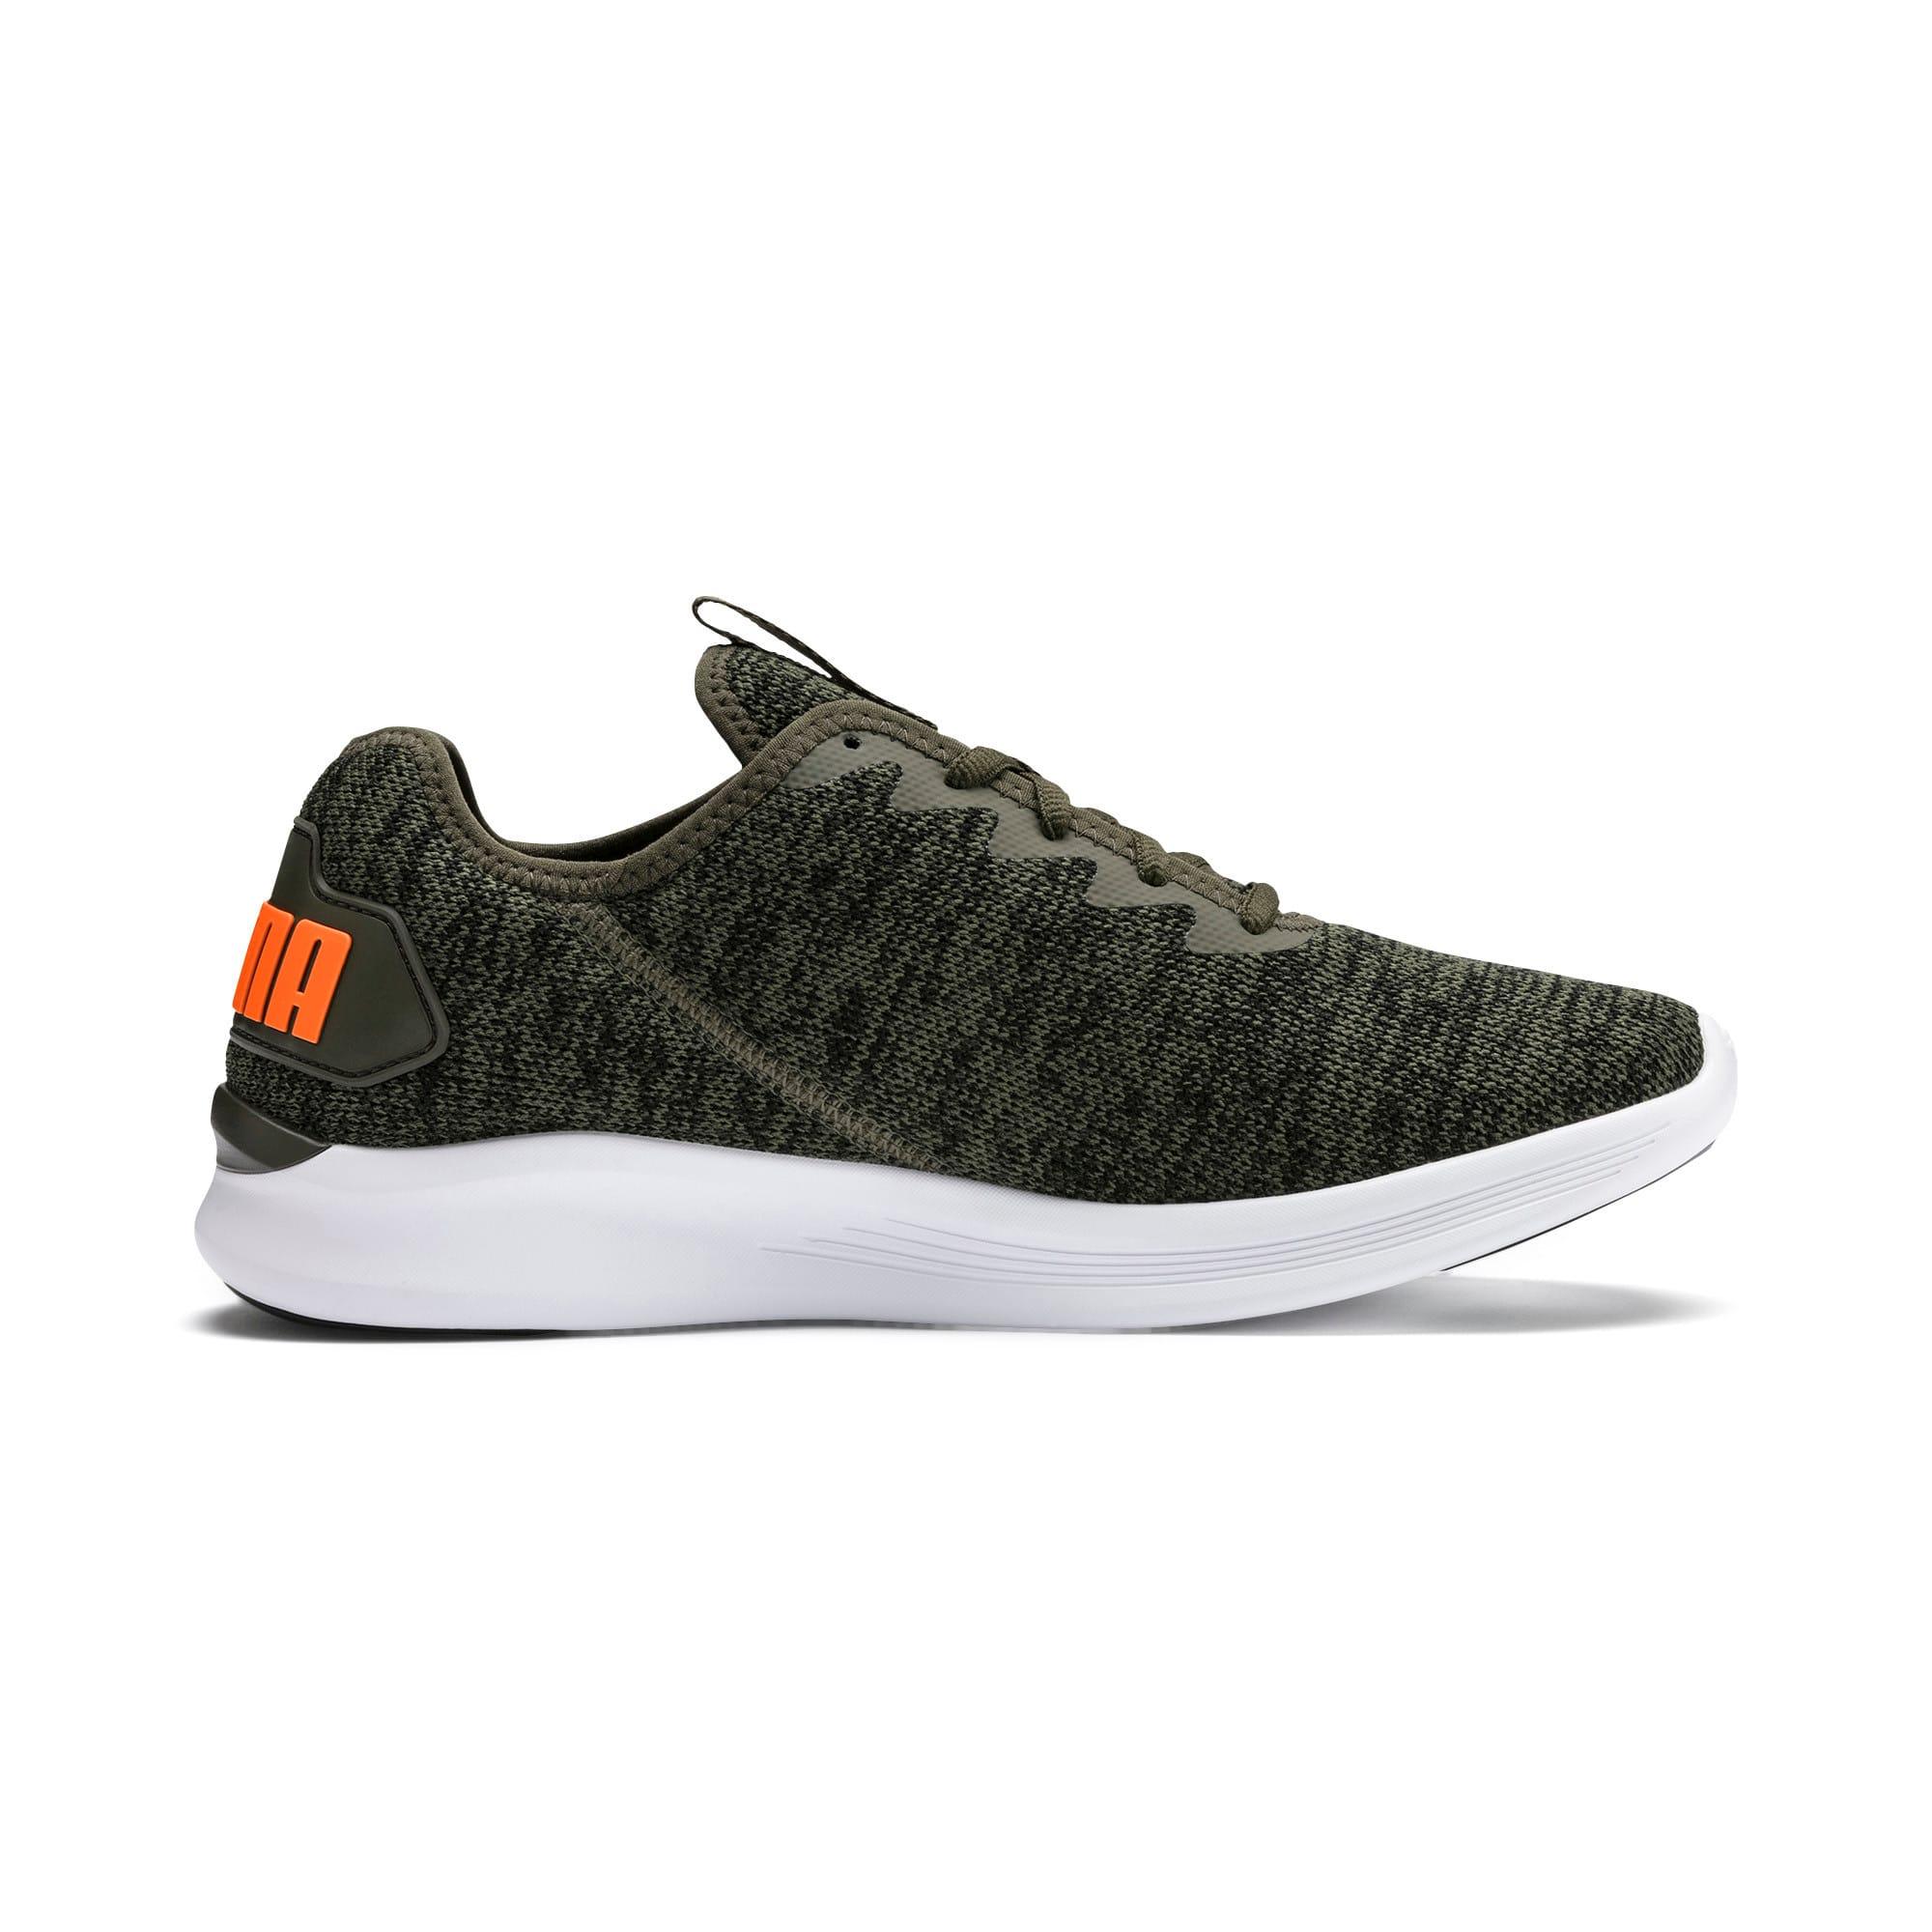 Thumbnail 7 of Ballast Men's Running Shoes, Forest Night-Black-Orange, medium-IND